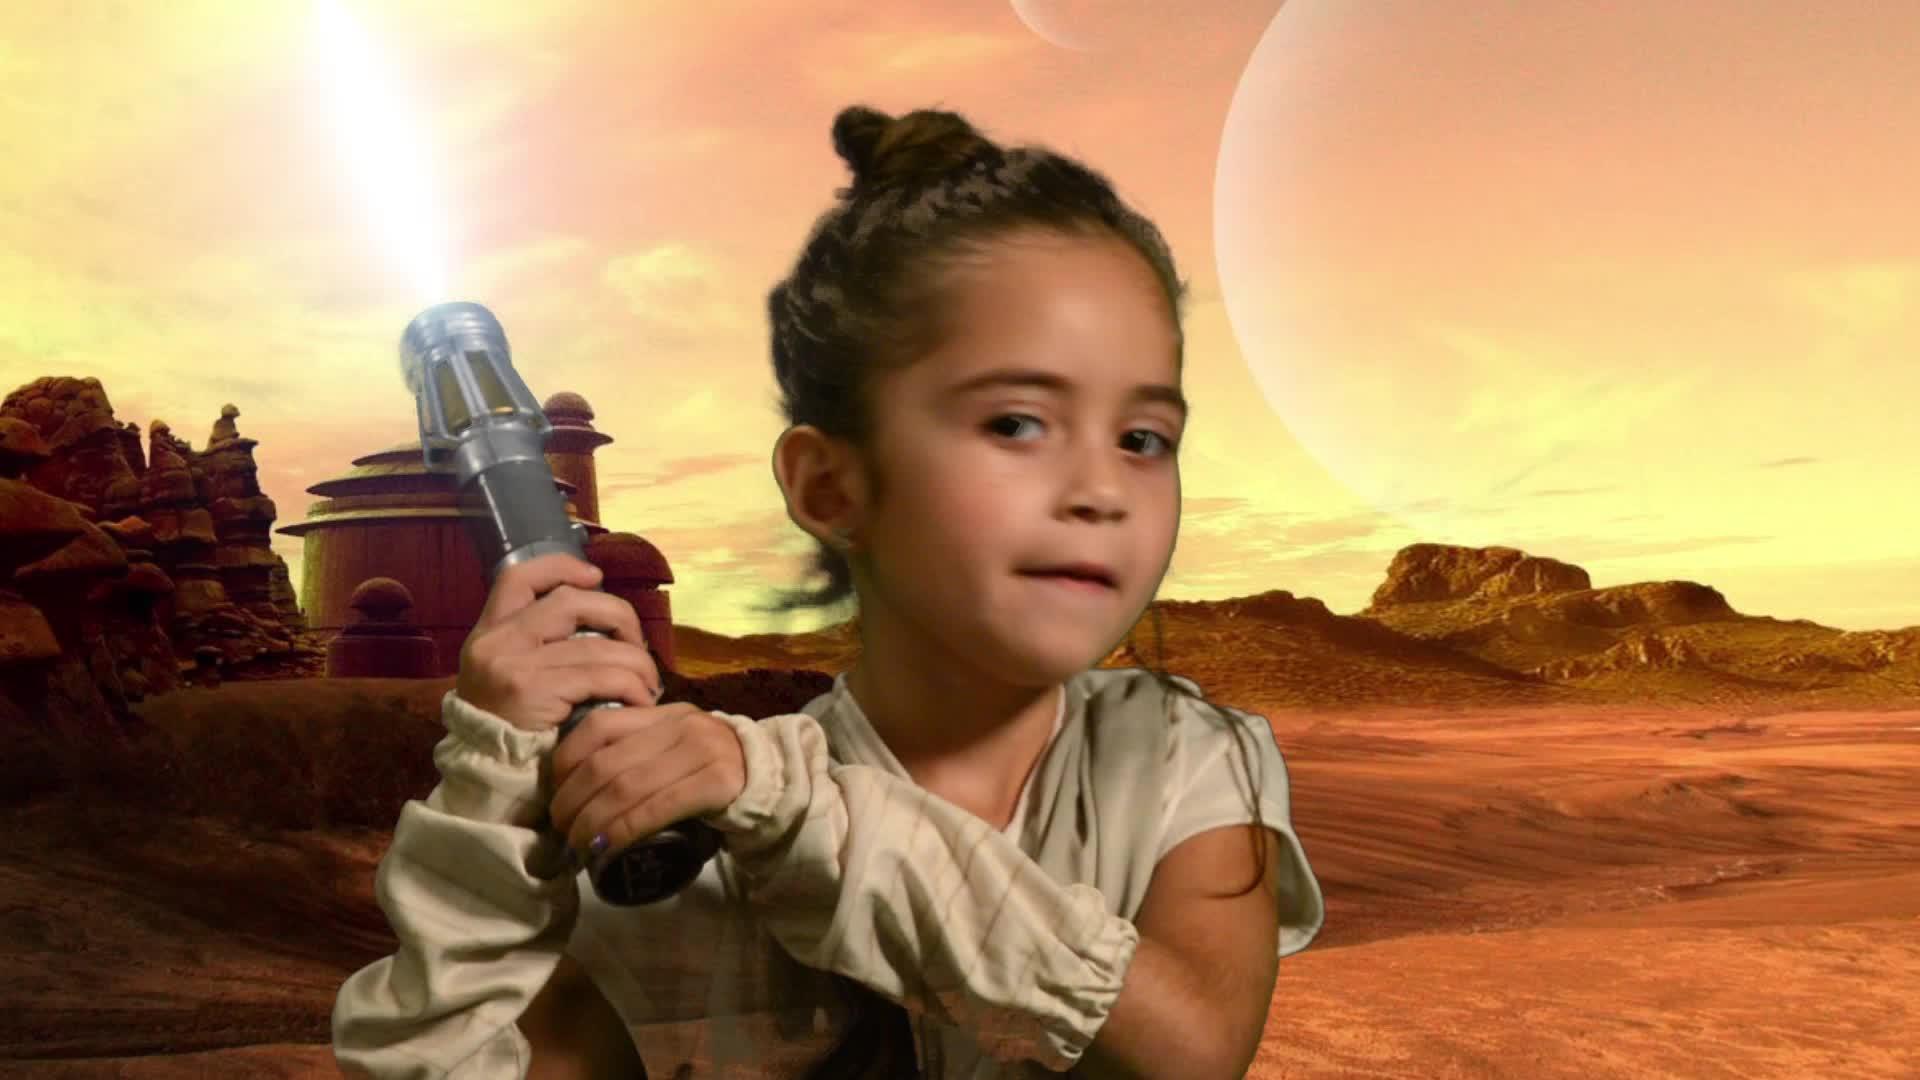 VEH The Young Rebel Star Wars Like Web Series